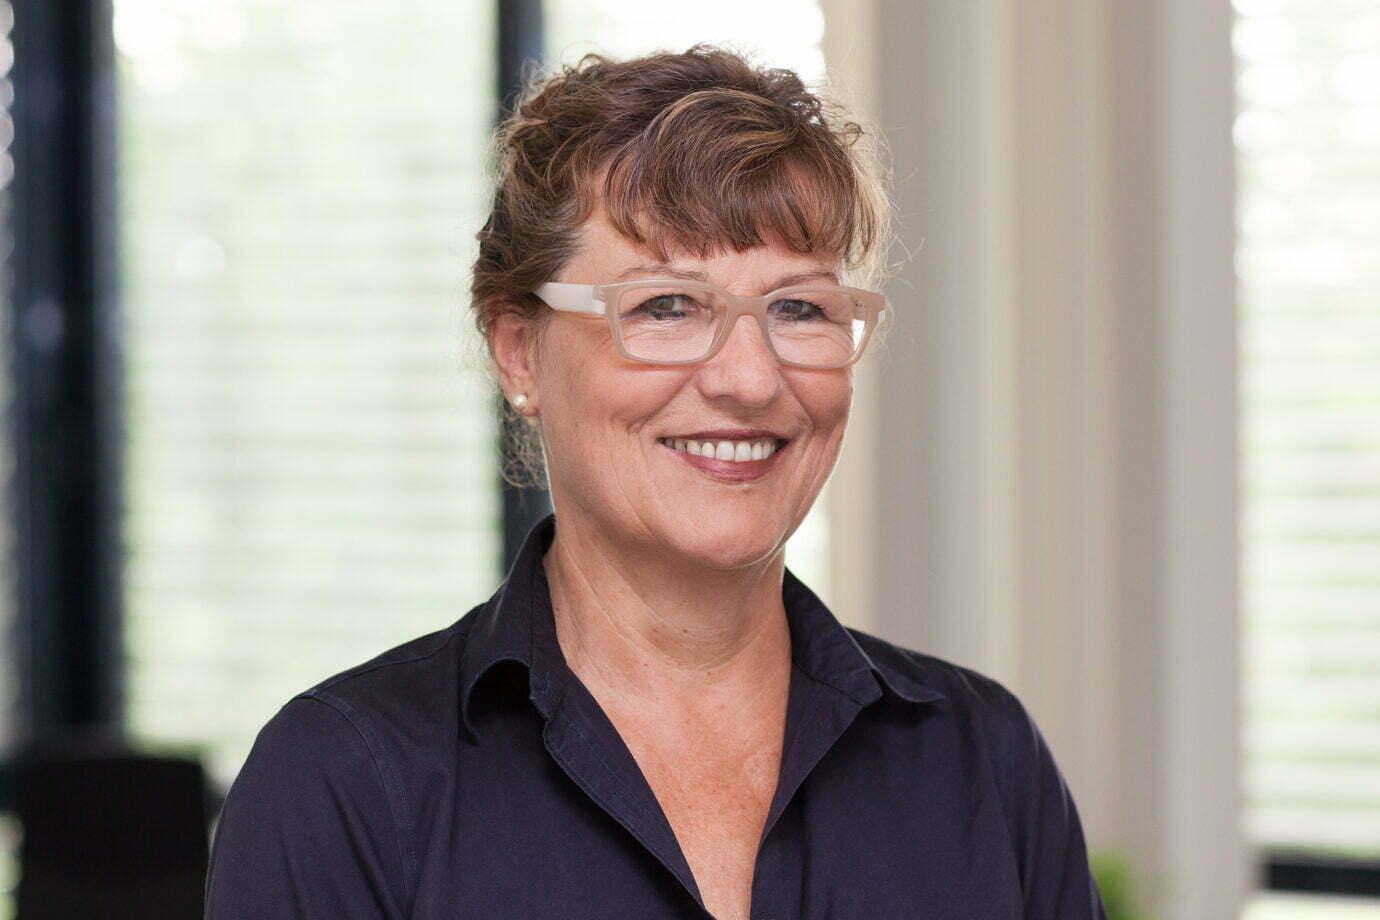 Sabine Traphöner